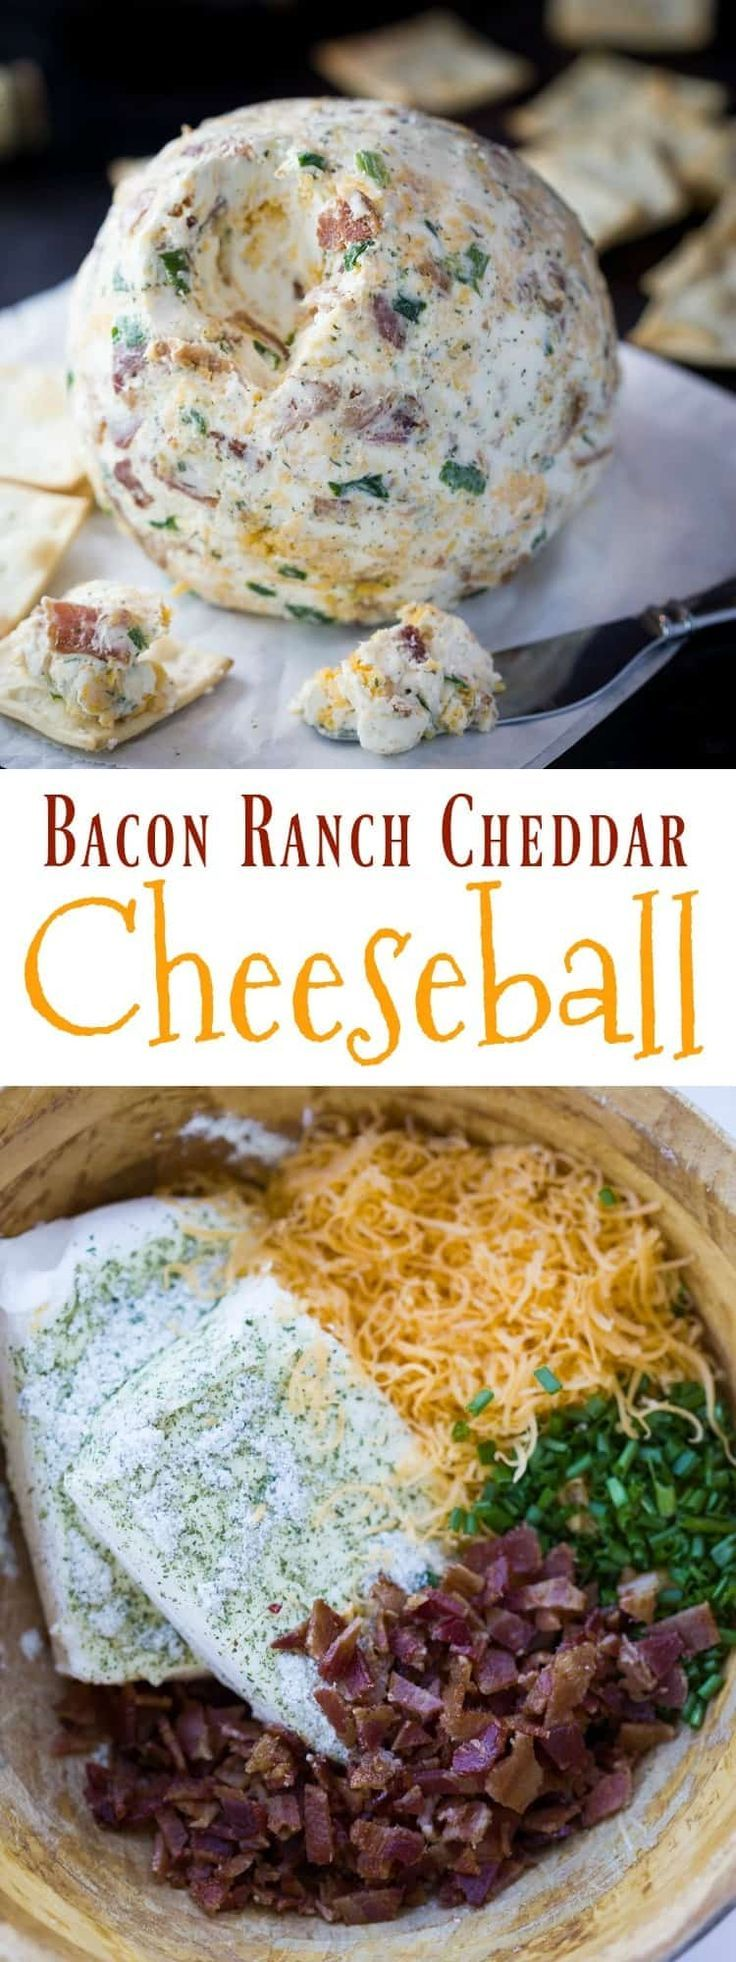 Boule de fromage cheddar ranch bacon Boule de fromage cheddar ranch bacon ,